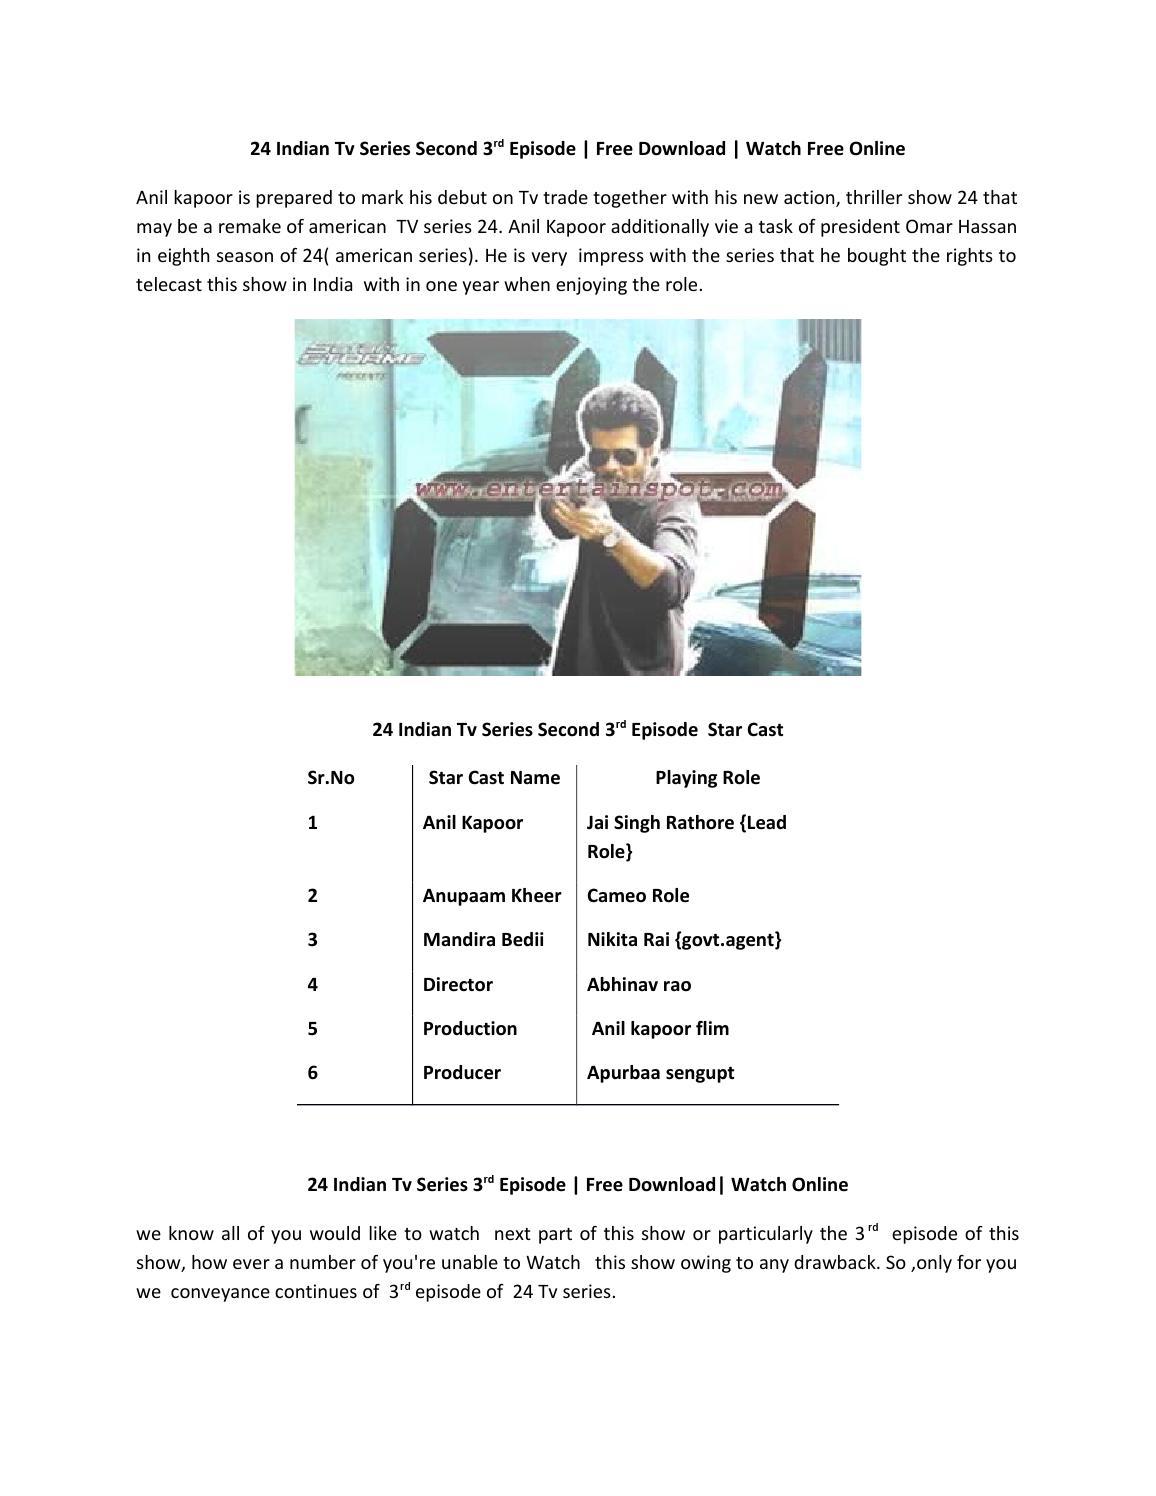 hindi tv series free download sites